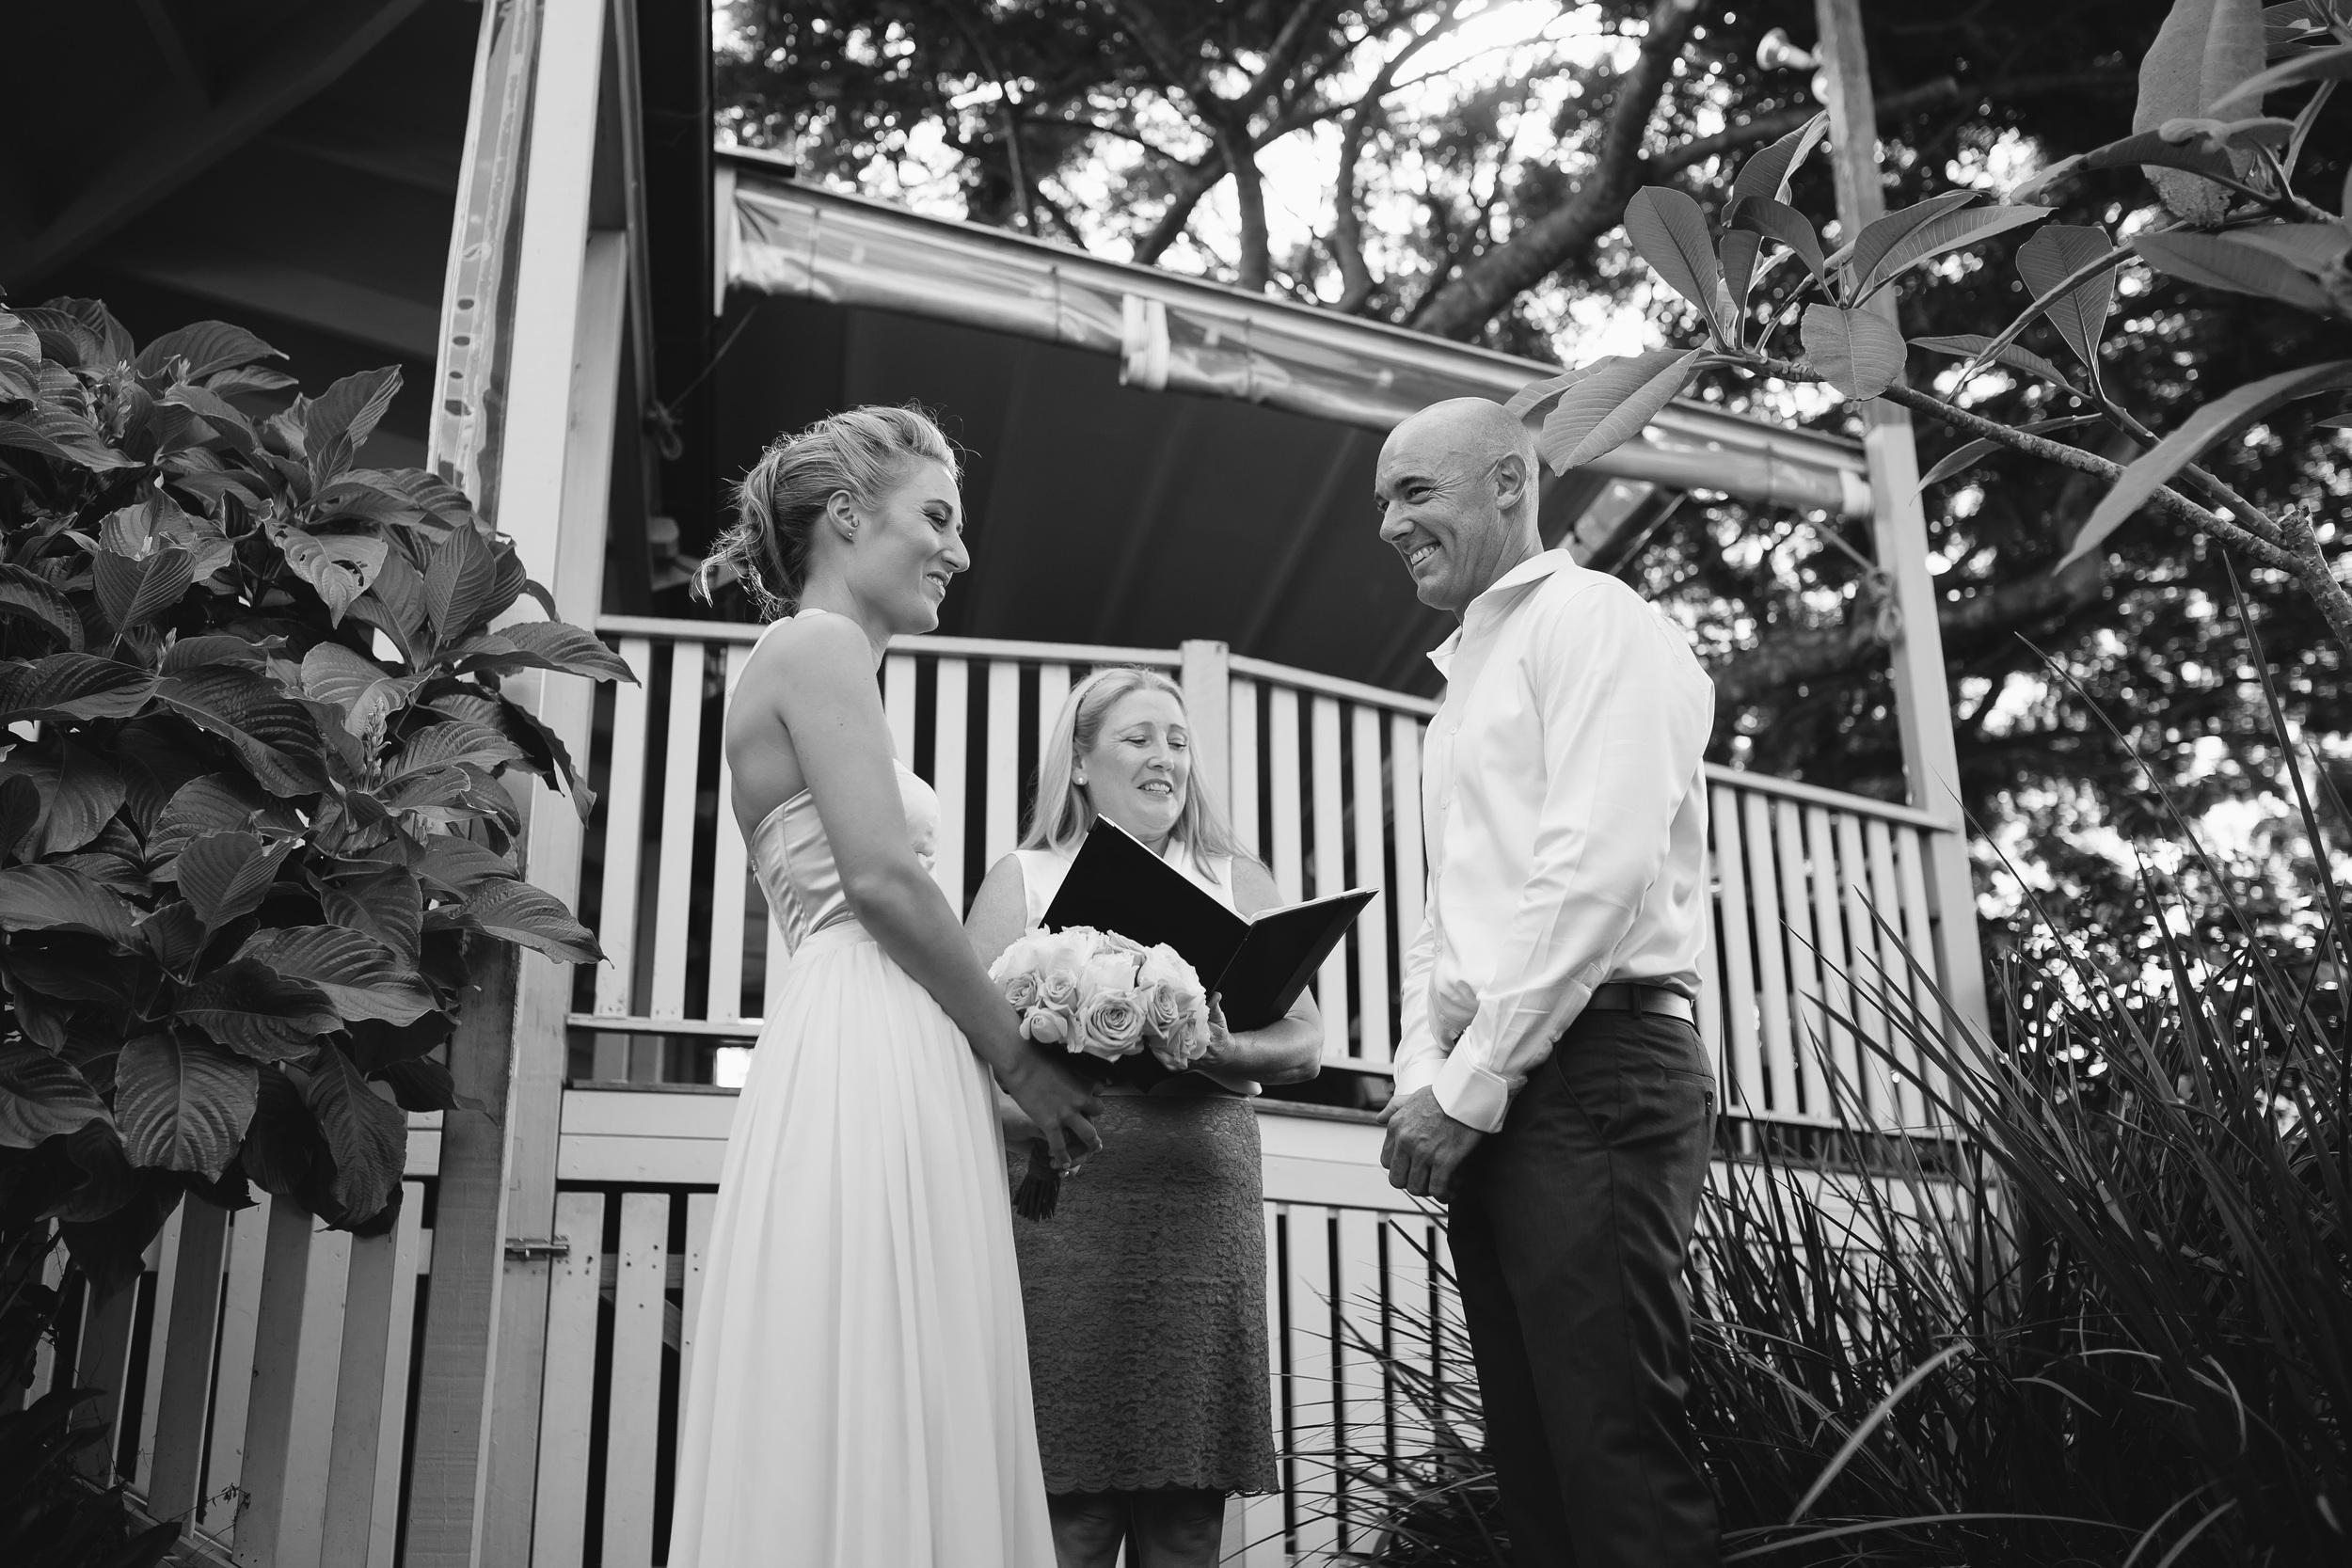 Byron Bay Wedding Harvest Cafe - Carly Tia Photography 009.jpg